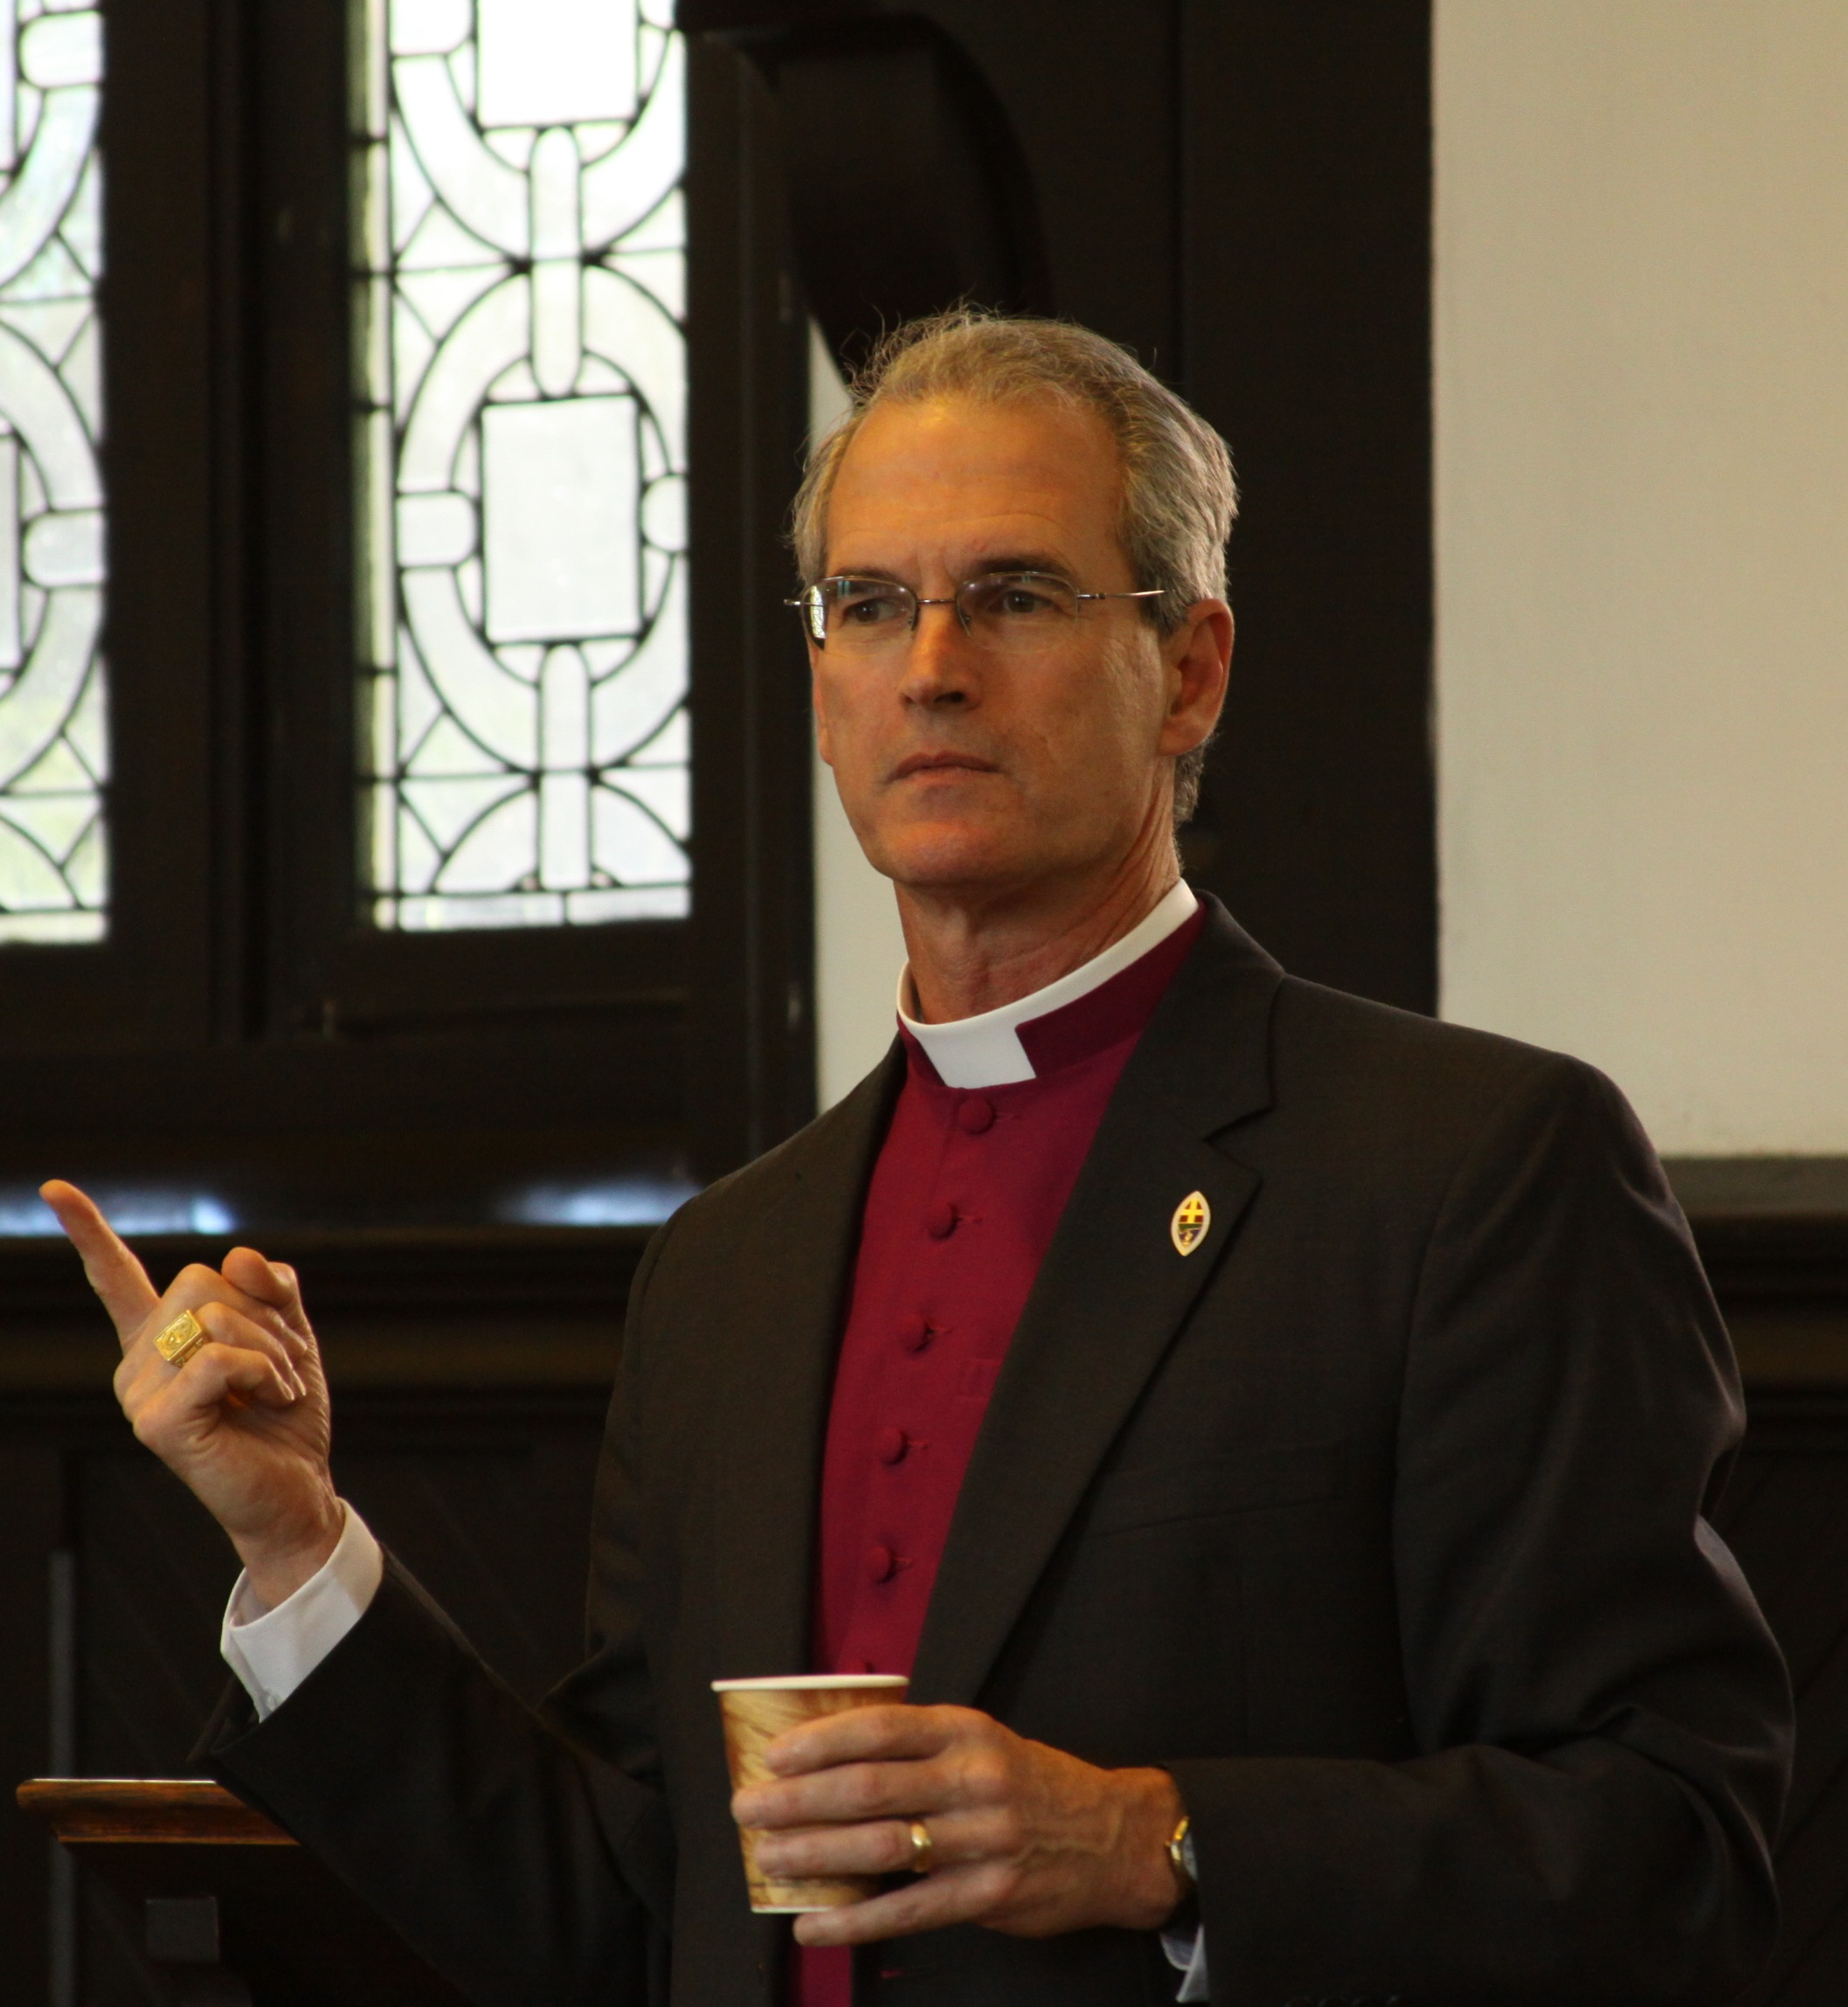 The Rt. Rev. G. Porter Taylor